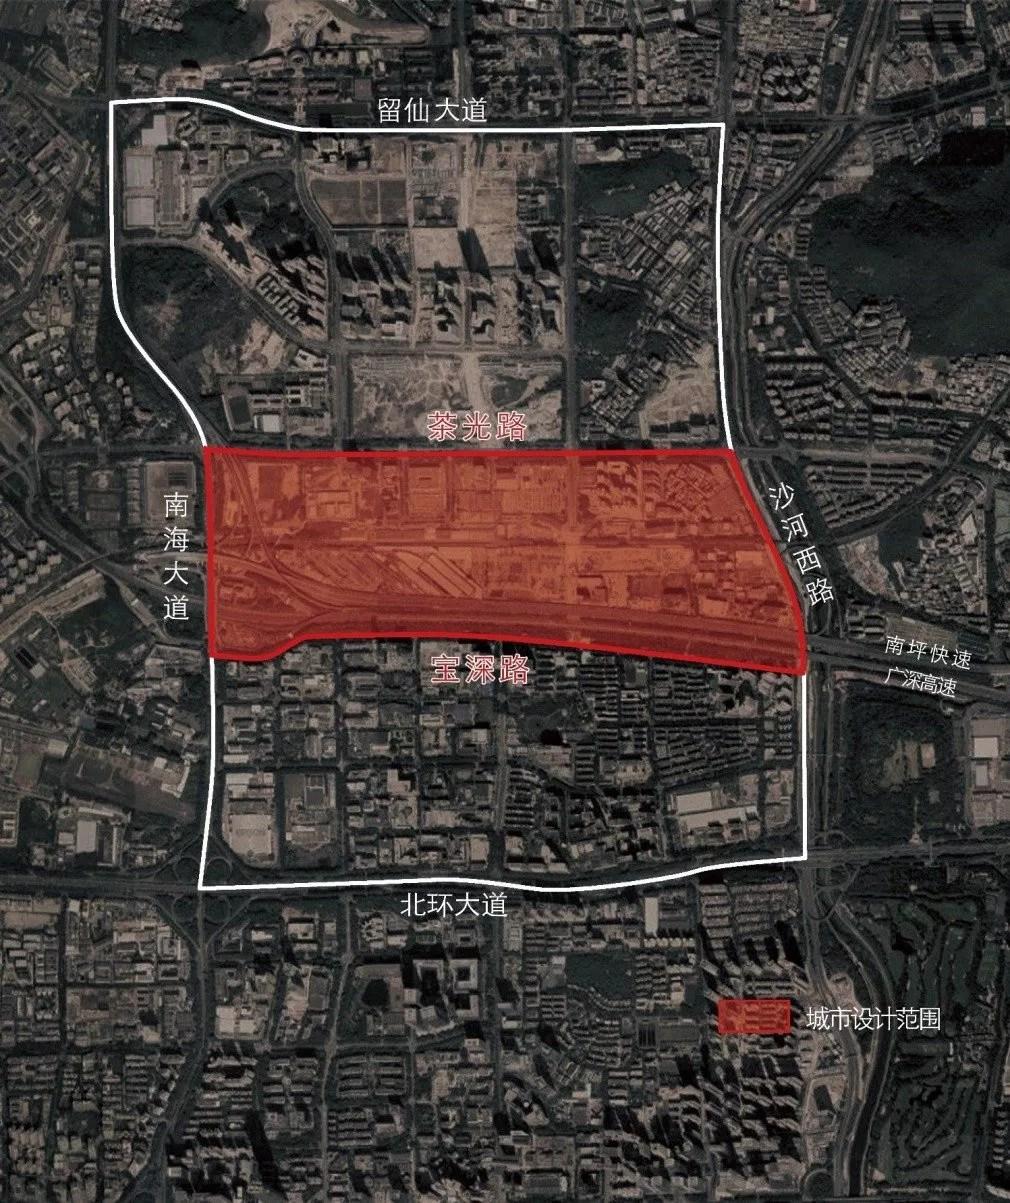 International Consultation on the Urban Design of Shenzhen